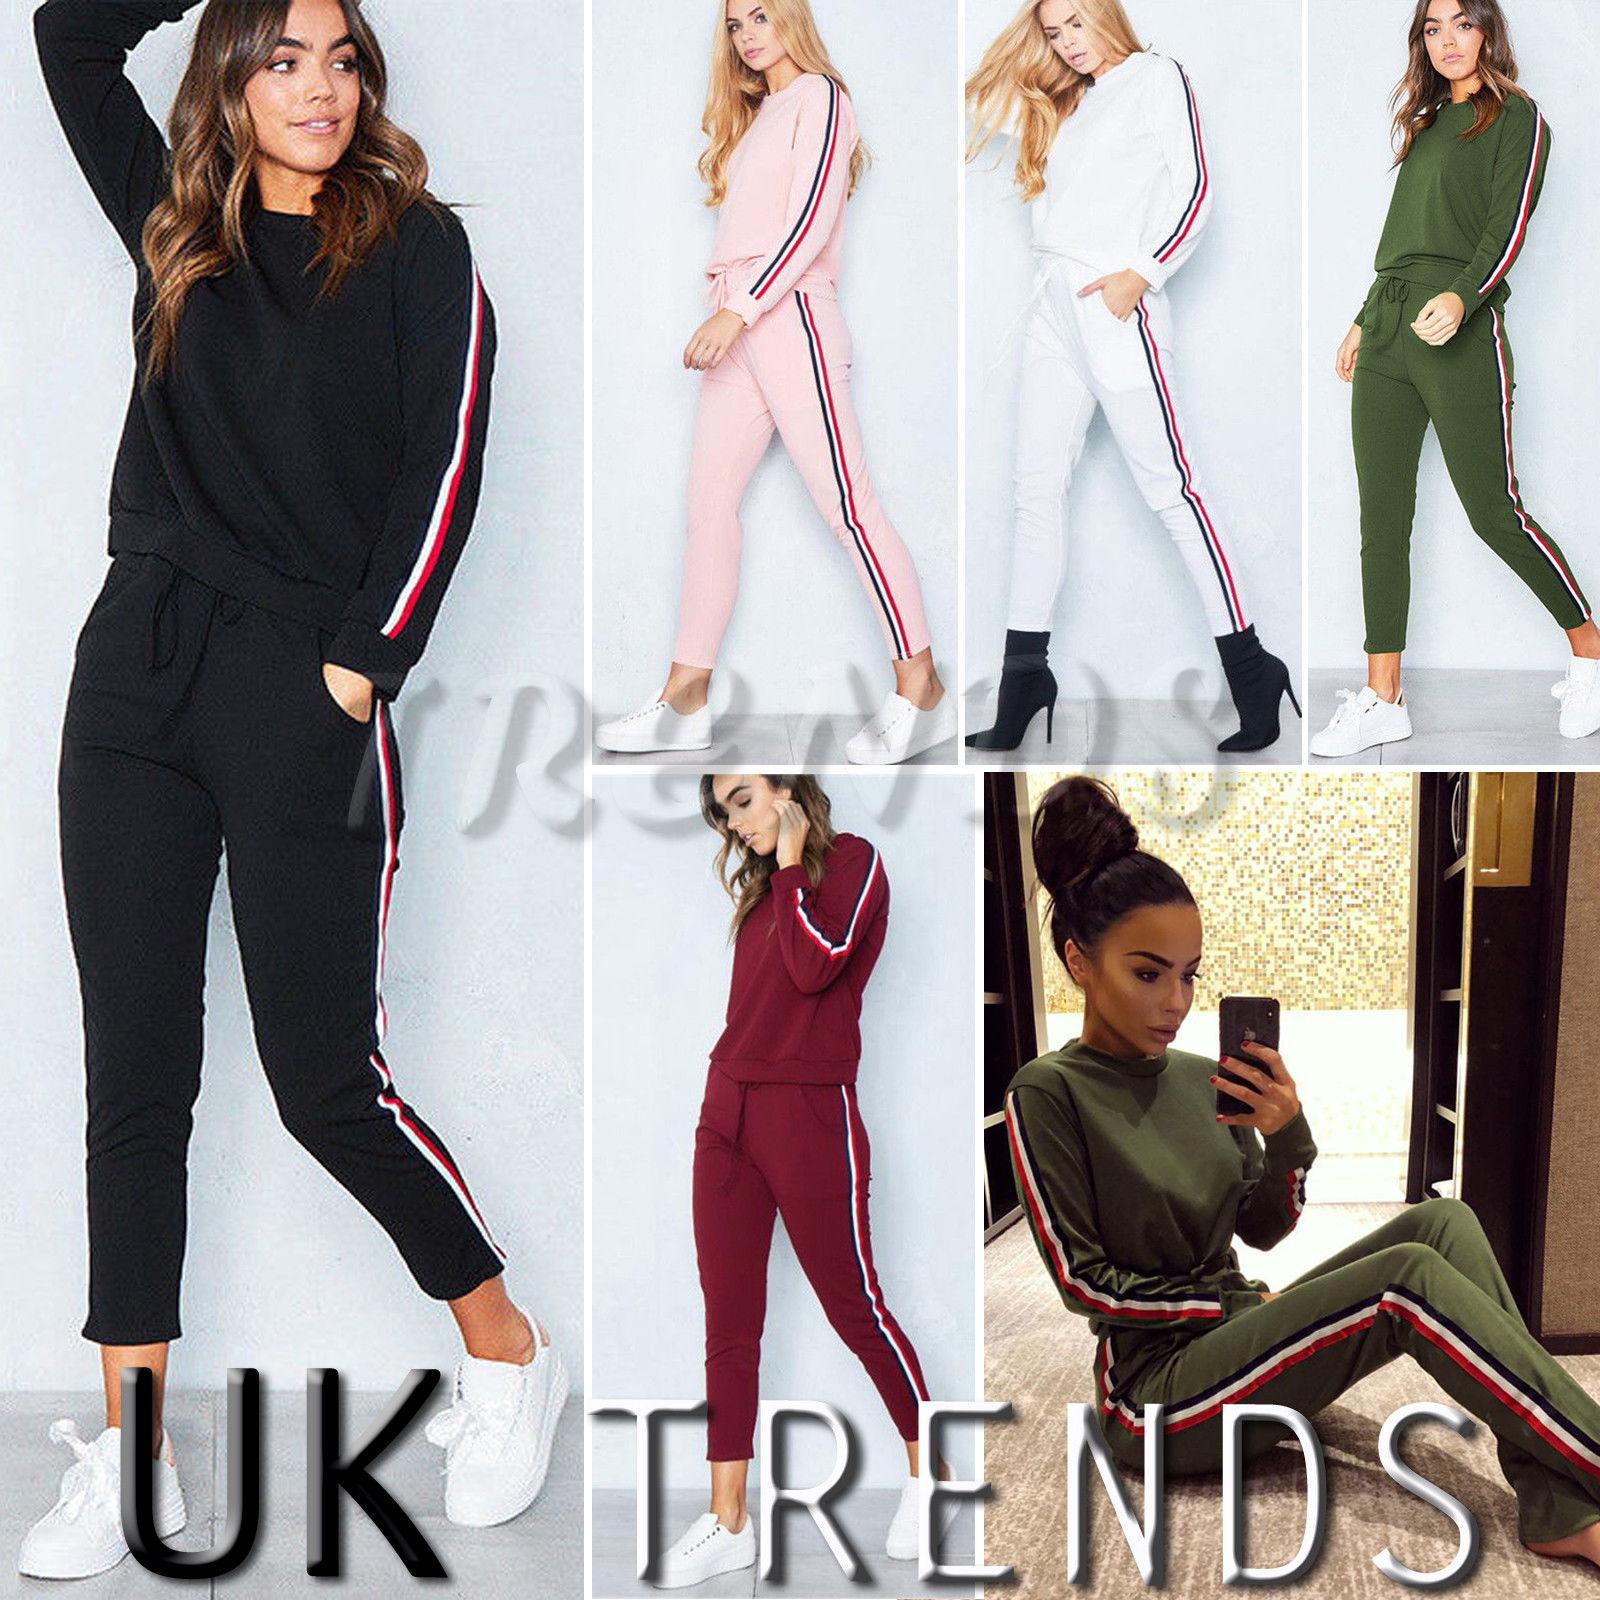 UK Womens 2 PCS Tracksuits Set Ladies Striped Active Sport Loungewear Size 6-16